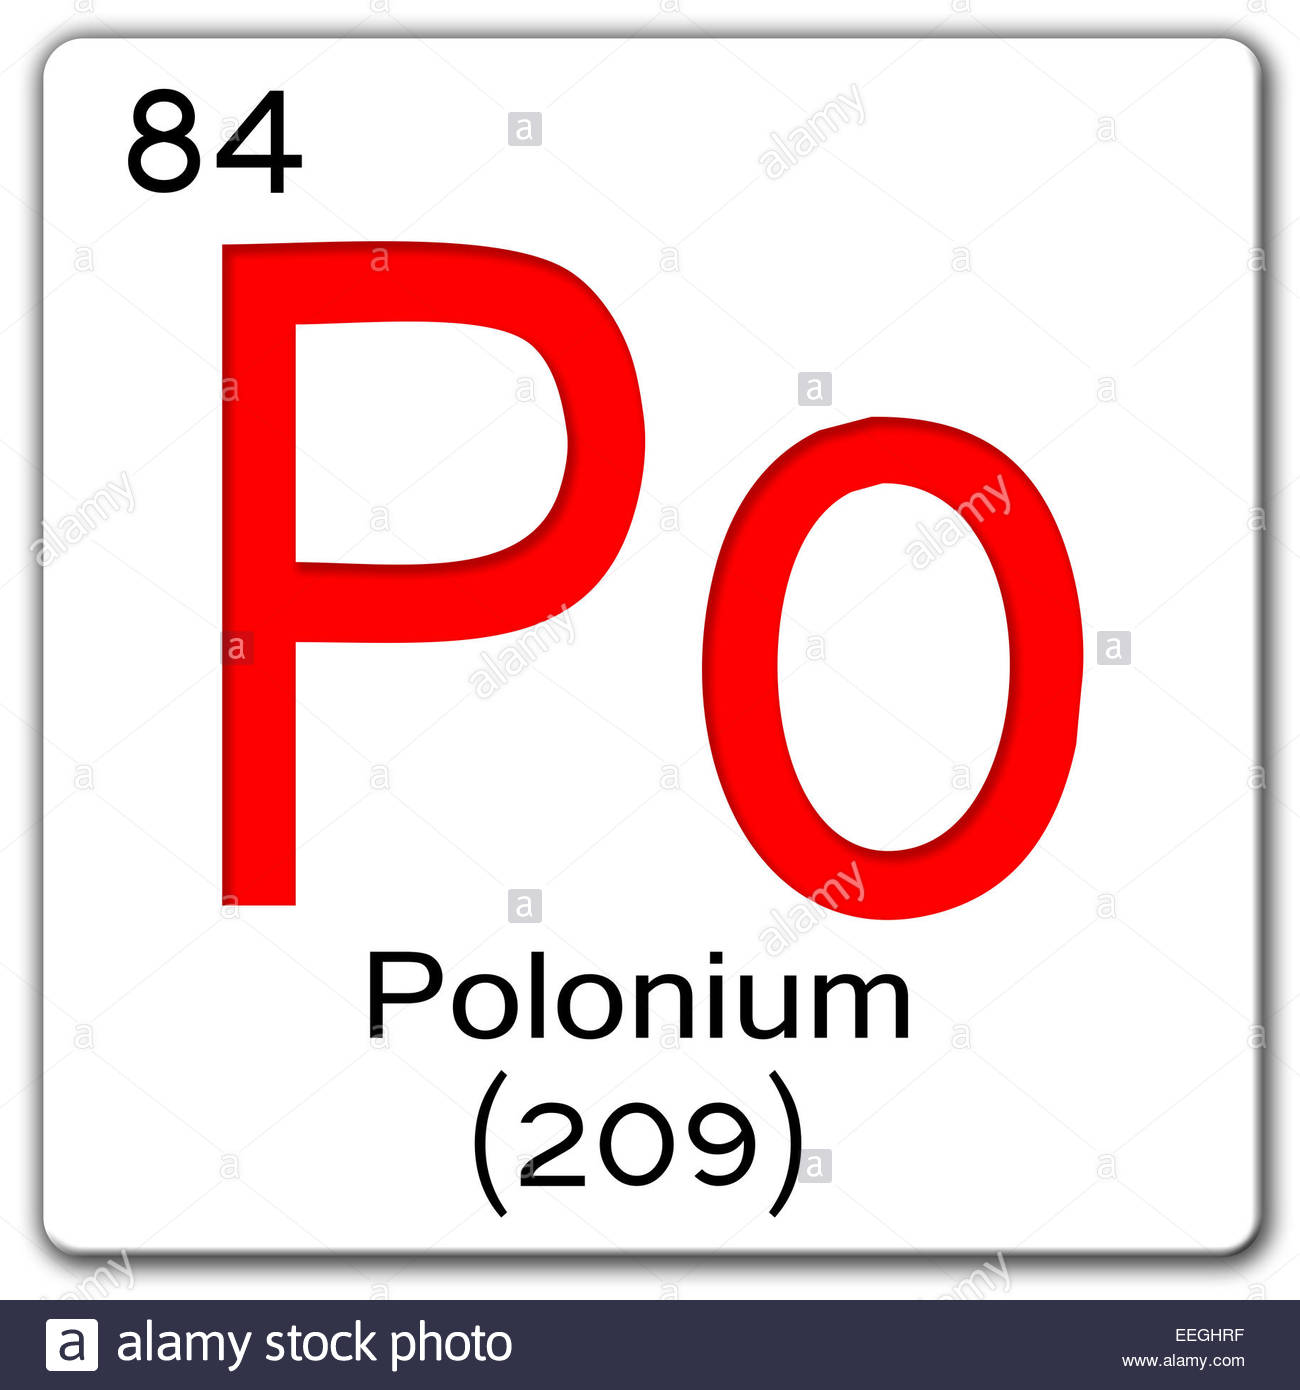 Chemical symbol stock photos chemical symbol stock images alamy polonium chemical symbol wallpaper stock image urtaz Images